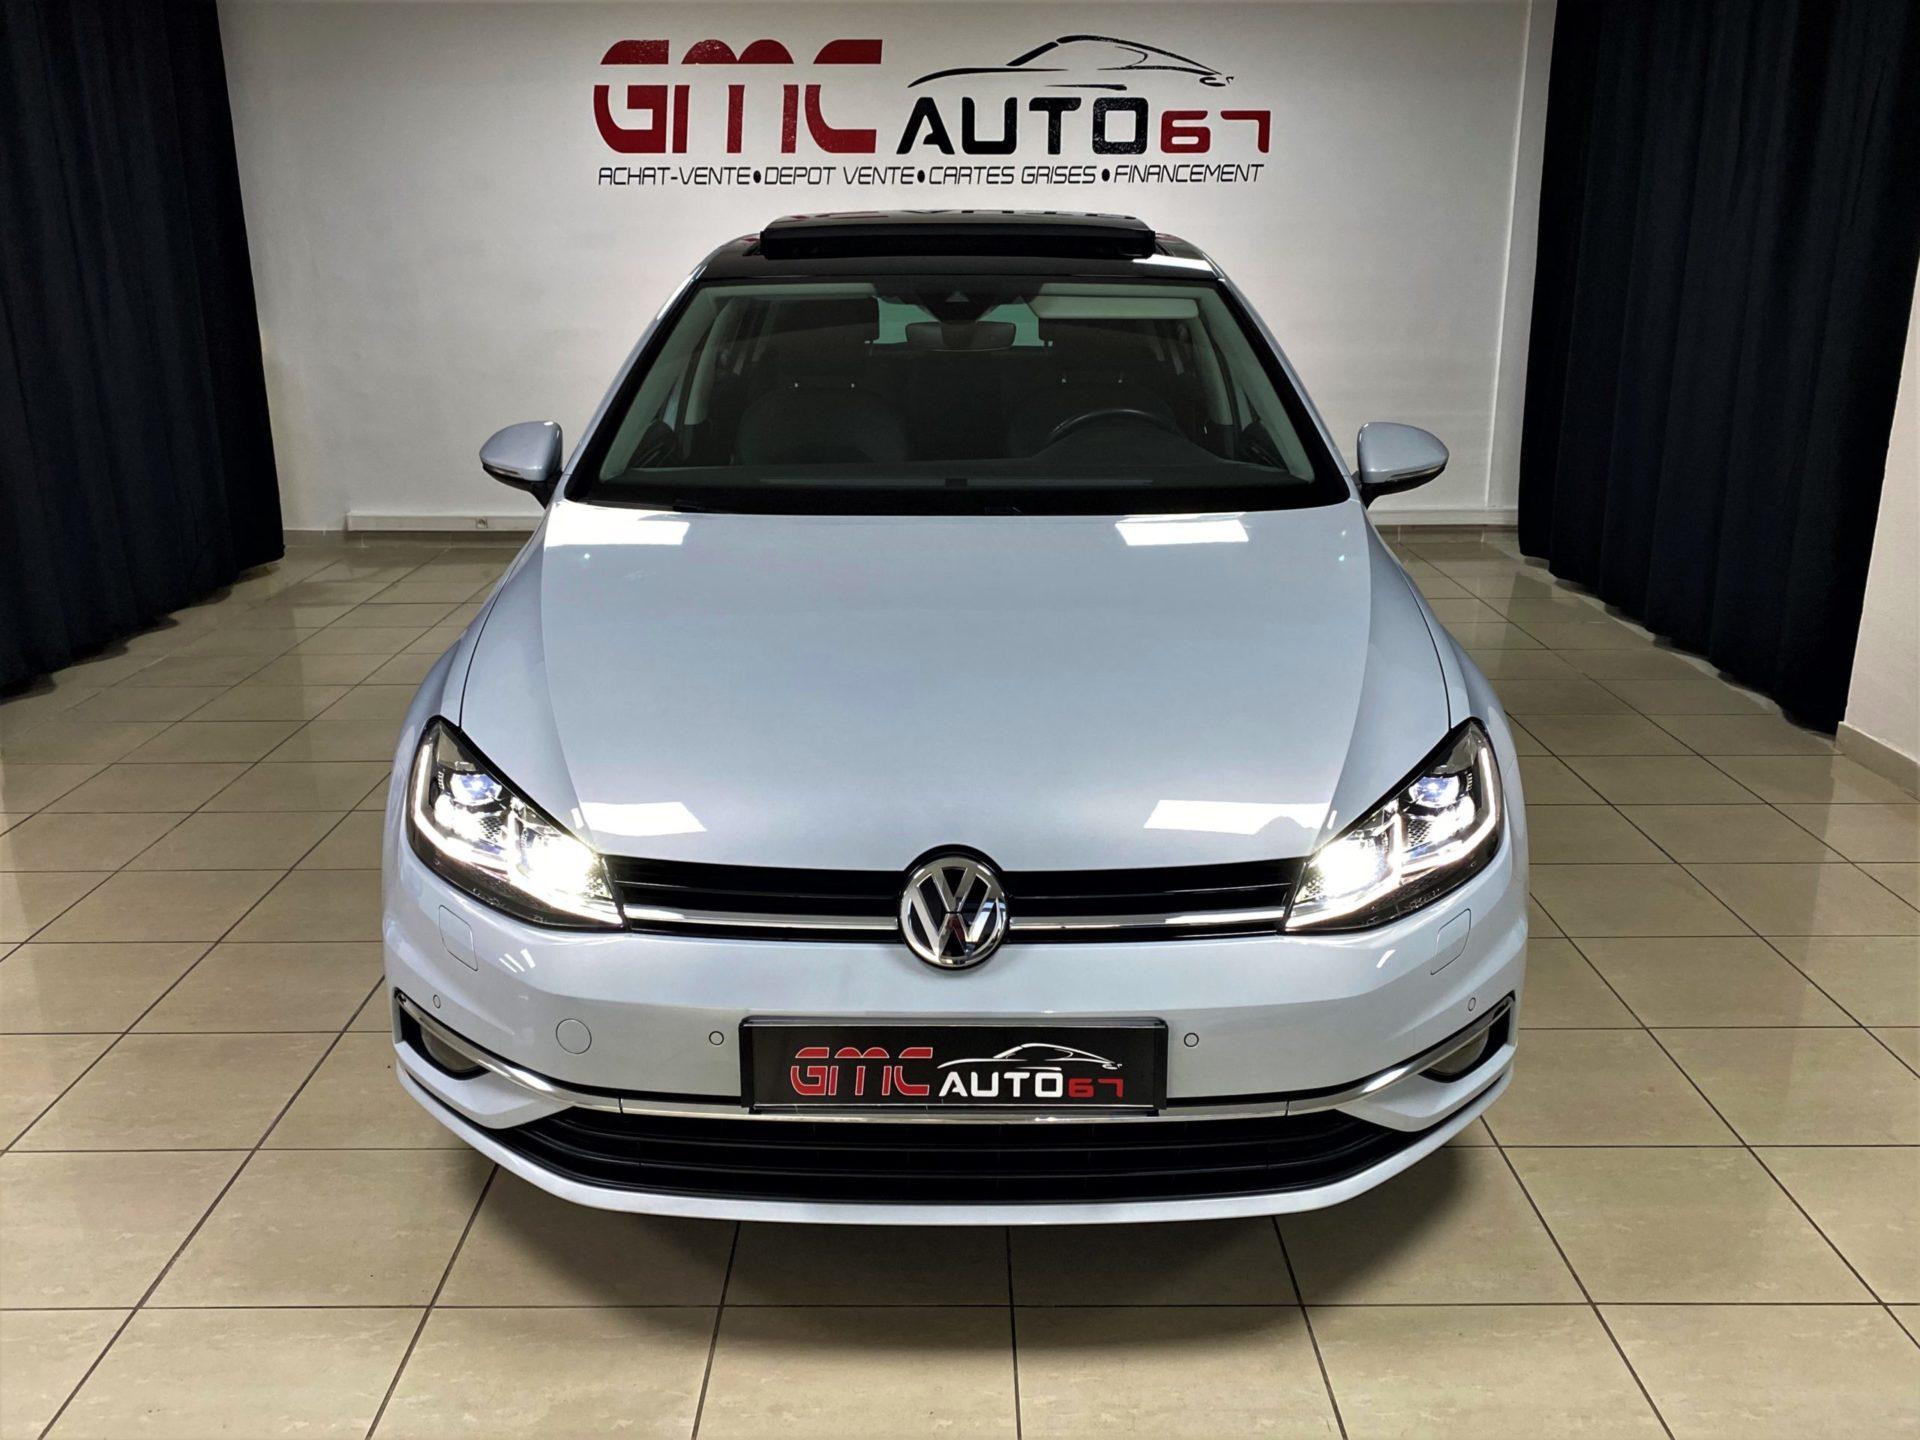 Volkswagen Golf 7 1.5 TSI 150 EVO BlueMotion Technology DSG7 Carat - GMC AUTO 67